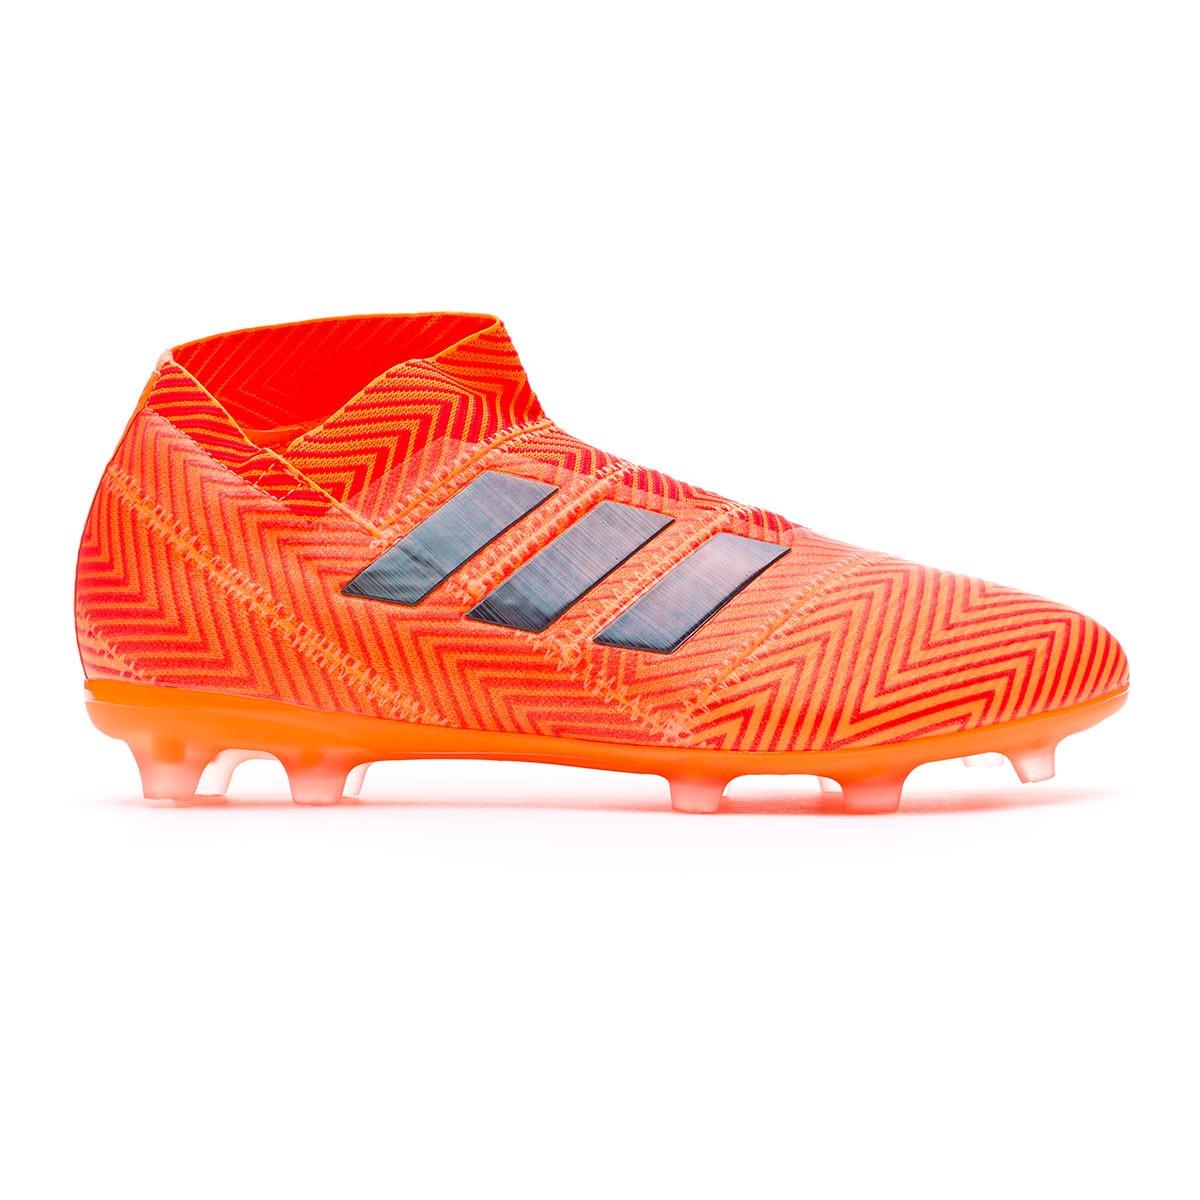 huge discount cb97d e7a00 Boot adidas Kids Nemeziz 18+ FG Zest-Black-Solar red - Leake